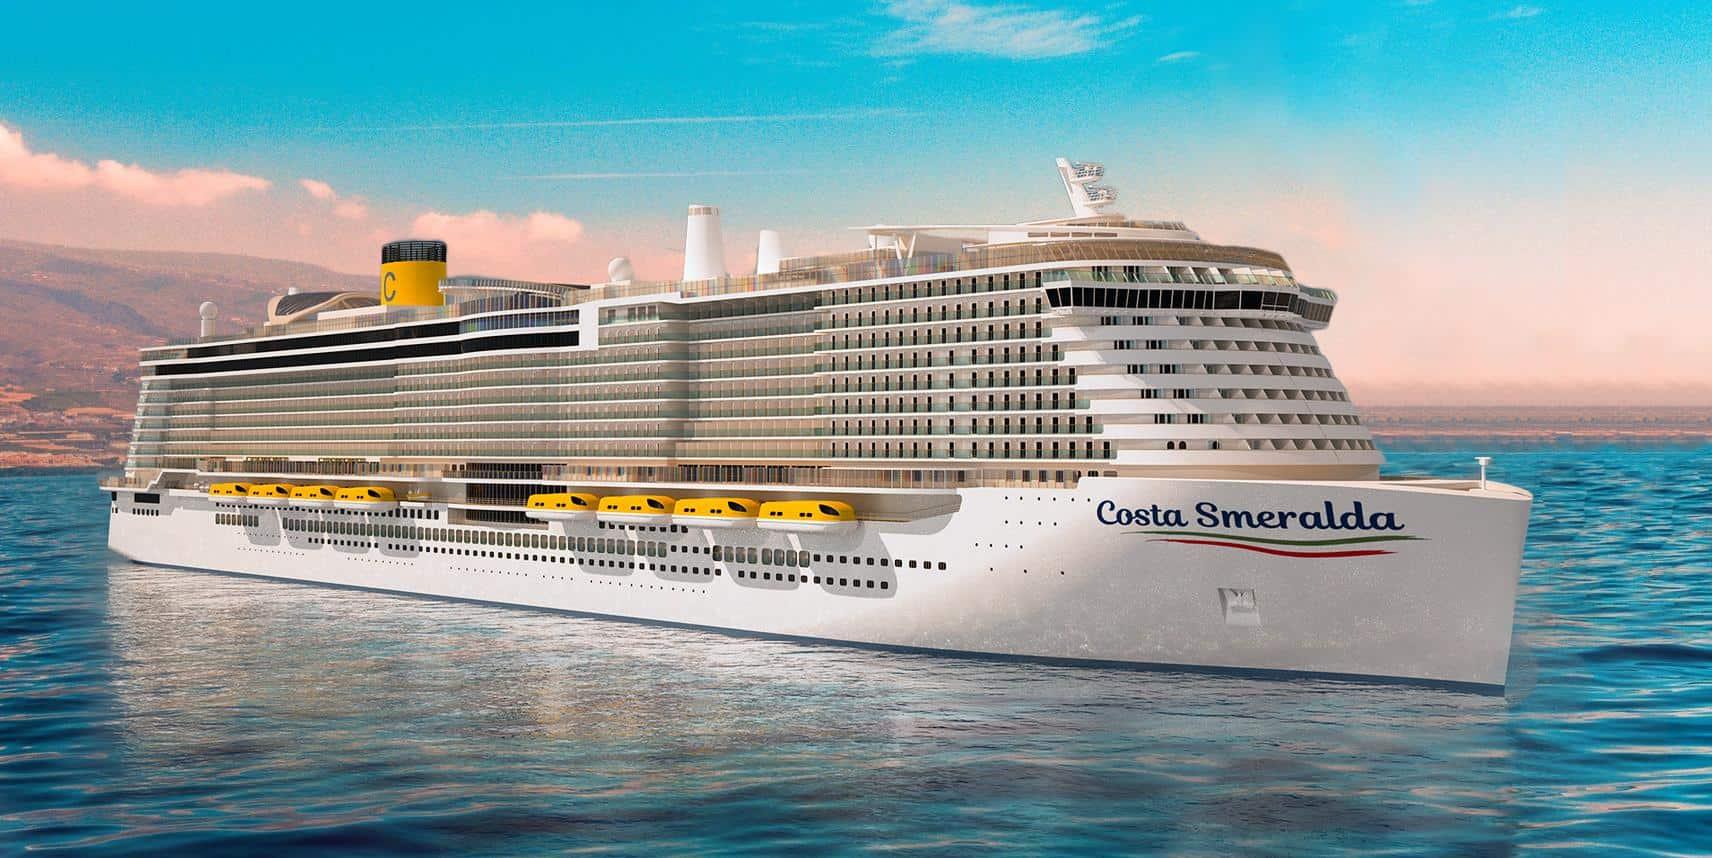 1-Costa-Smeralda-Cruceros-Mediterraneo-Barcelona